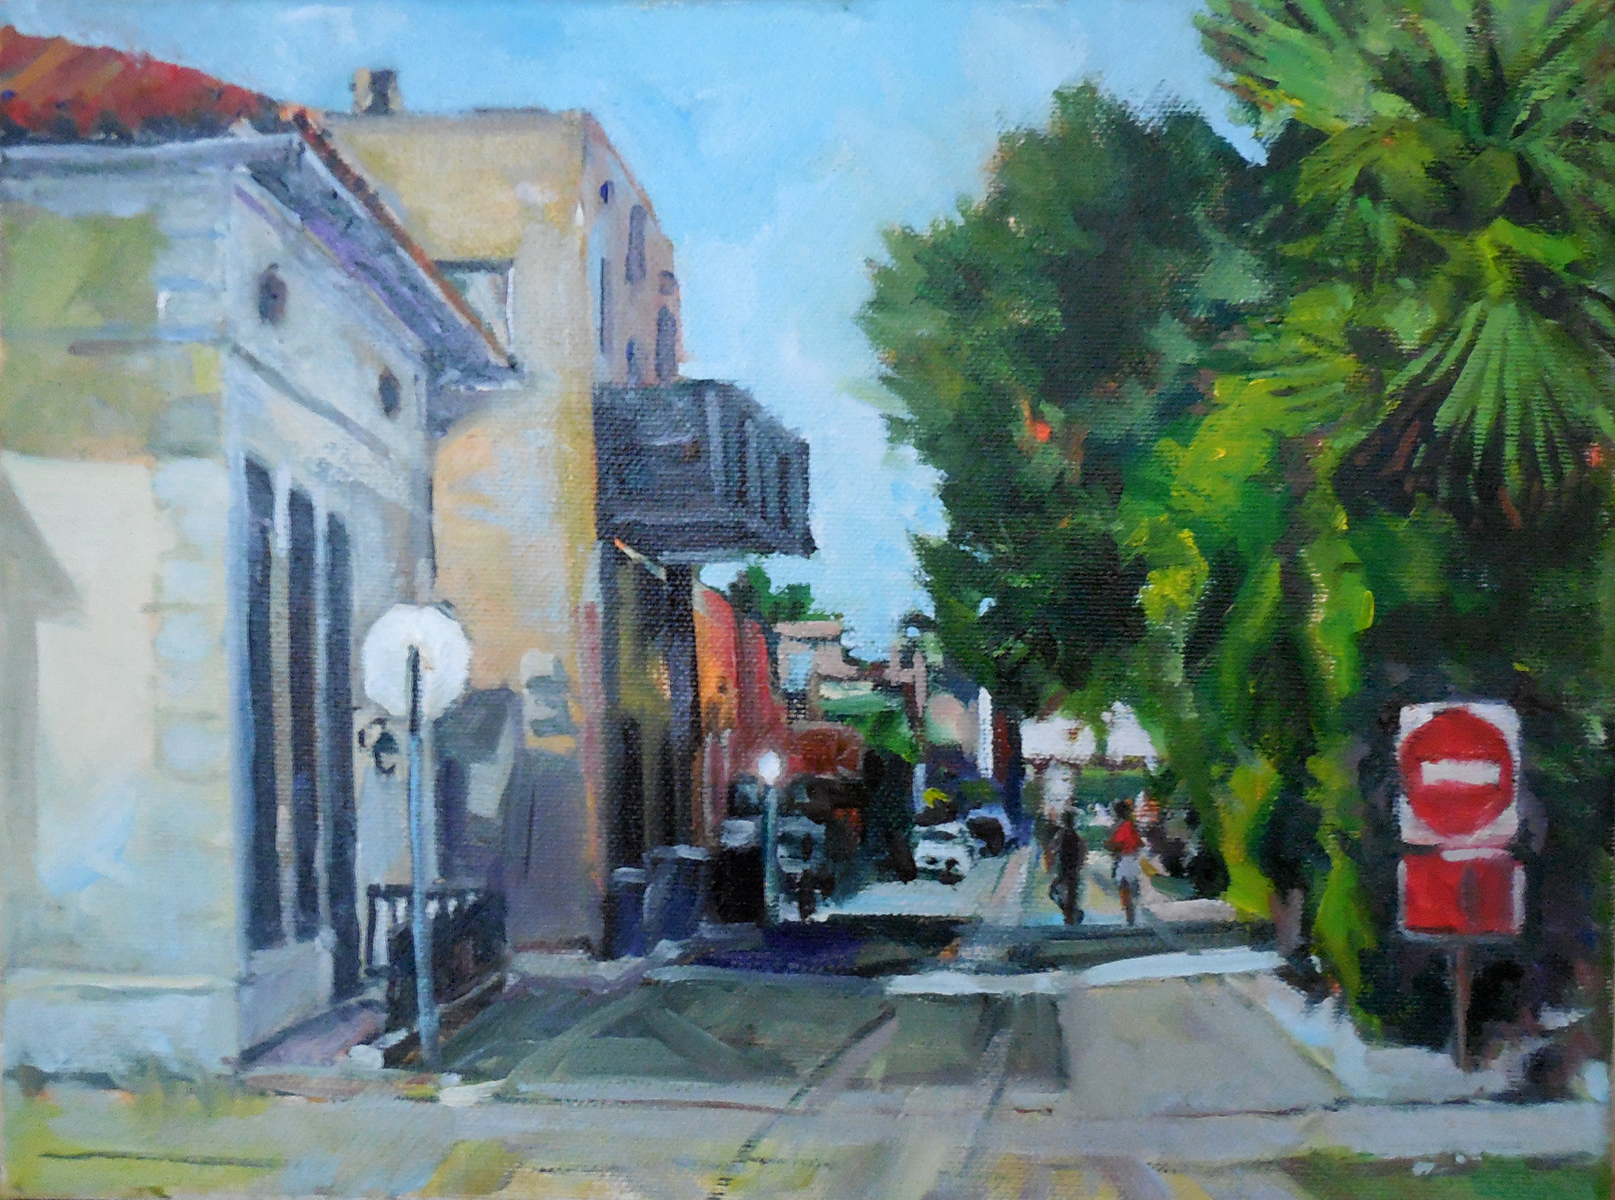 Alley Behind Sunkist Building, Oil, 9x12, $600